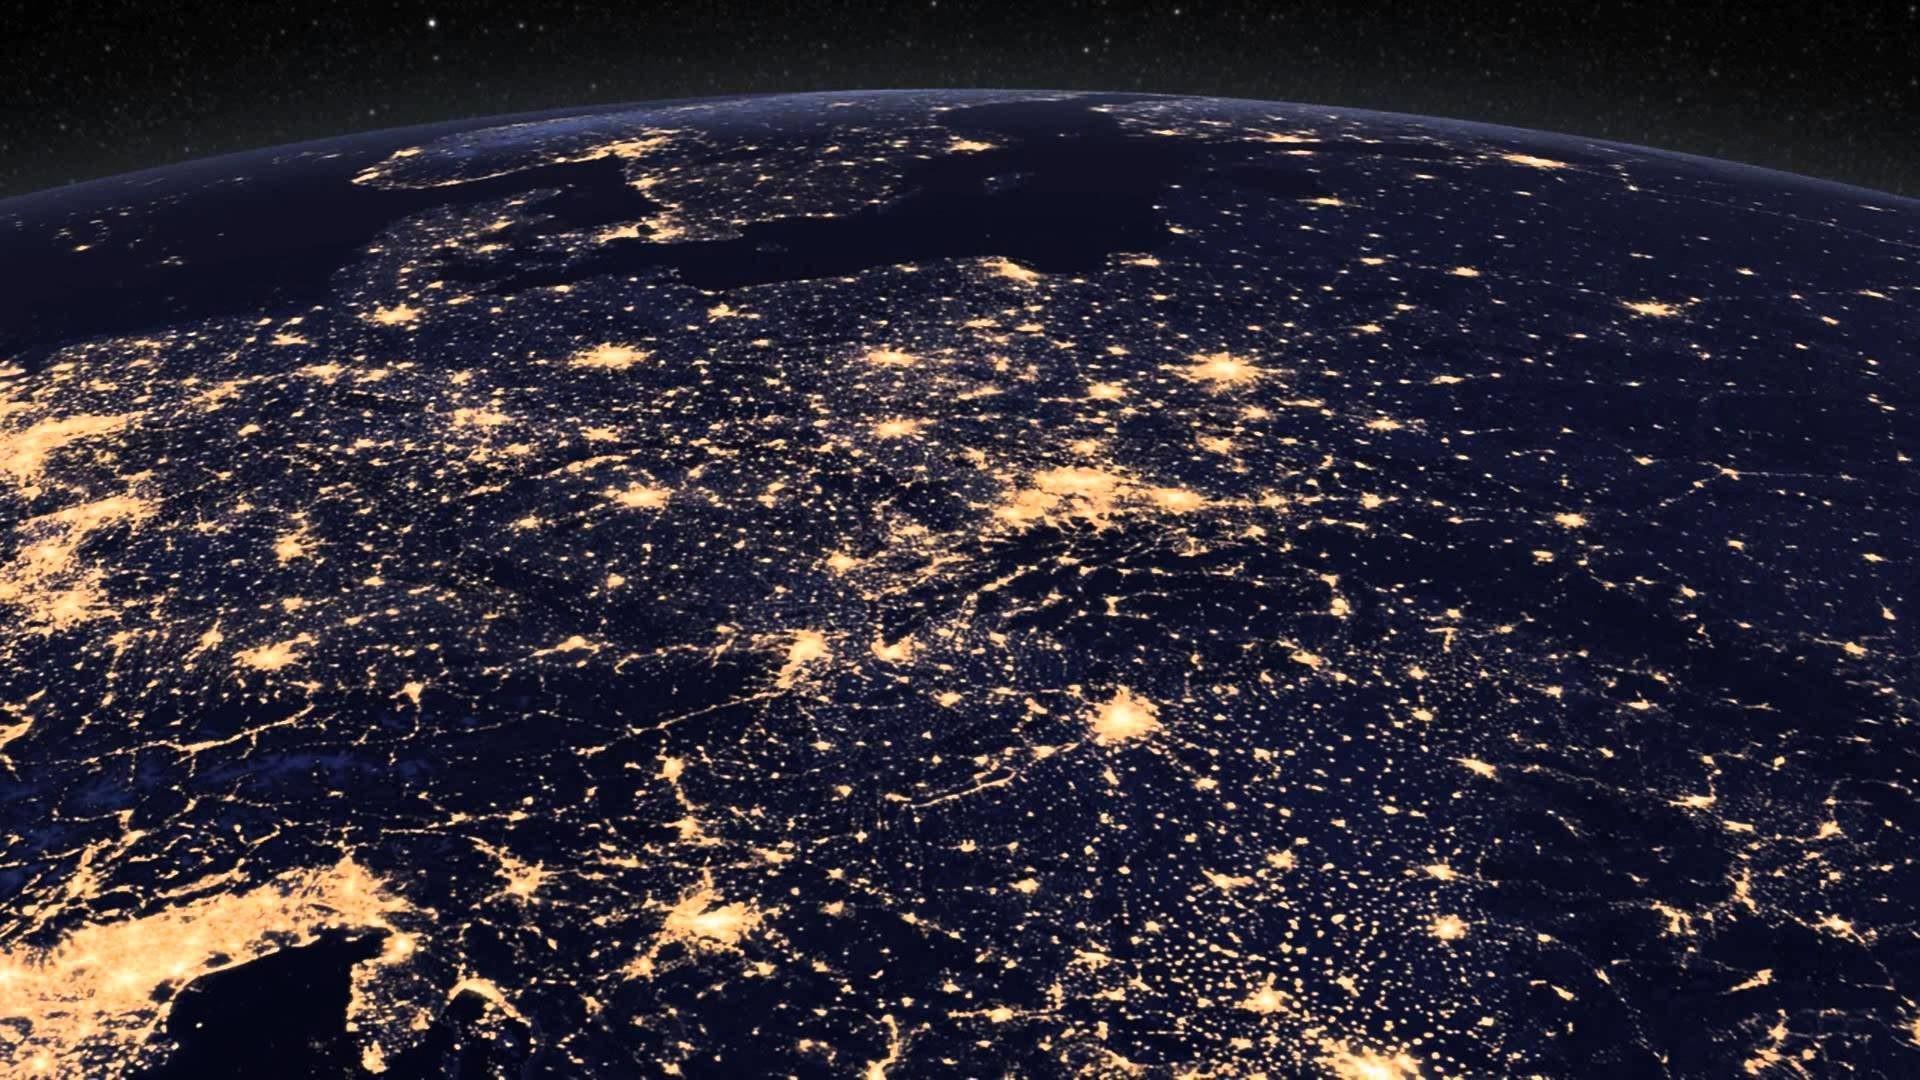 Earth At Night Wallpaper Hd 66 Images